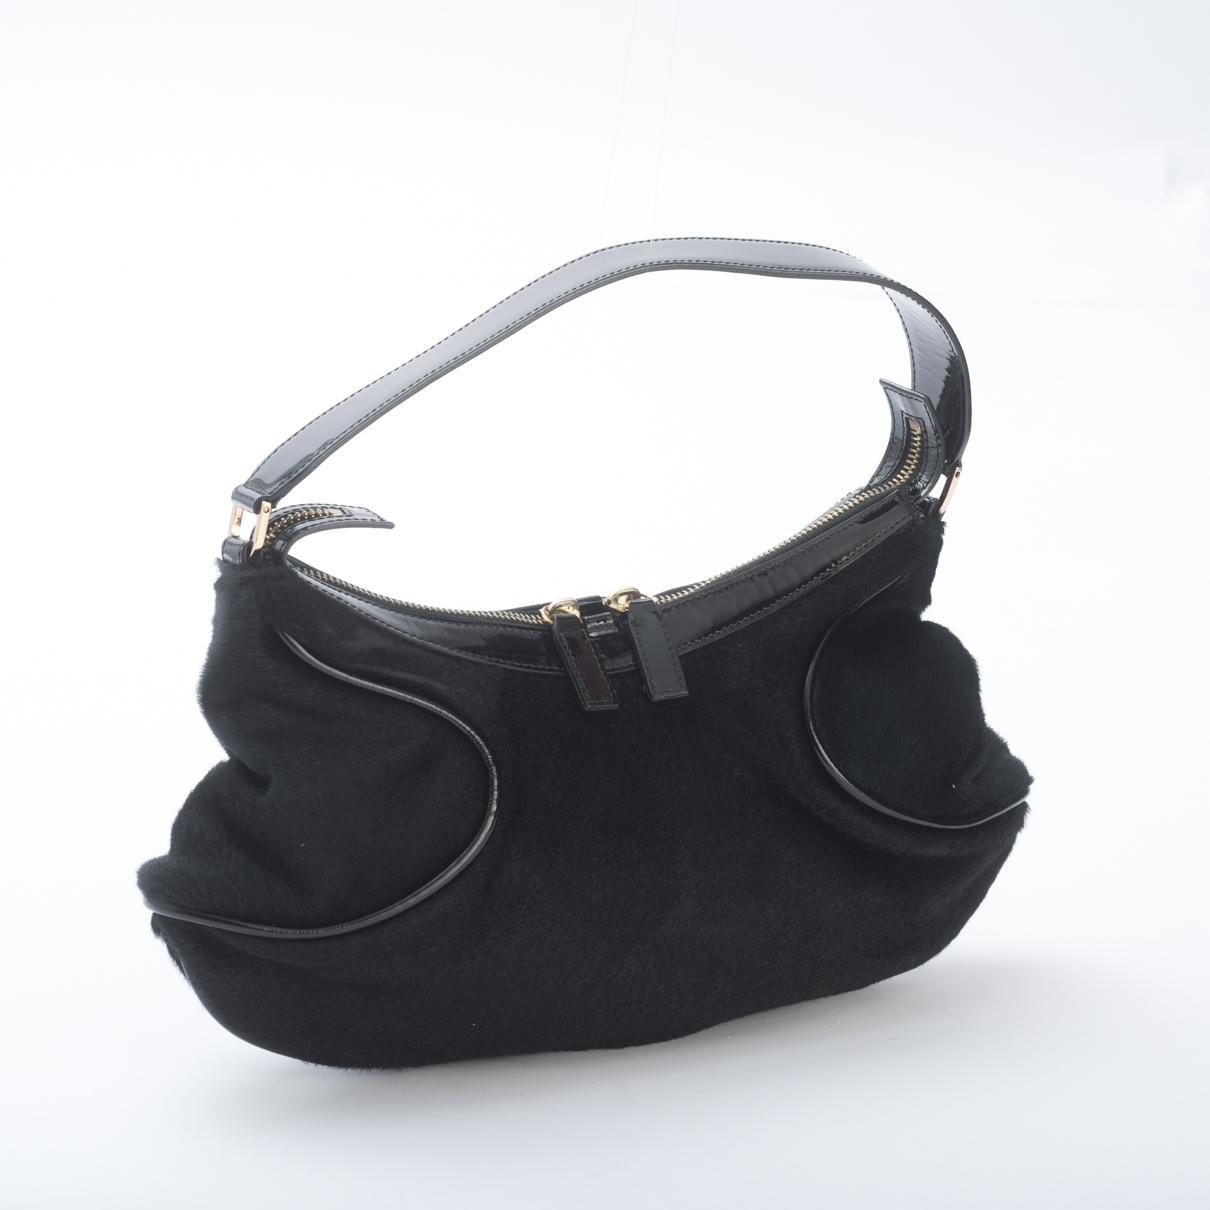 d2fb714a86d6 Versace - Black Pony-style Calfskin Handbag - Lyst. View fullscreen